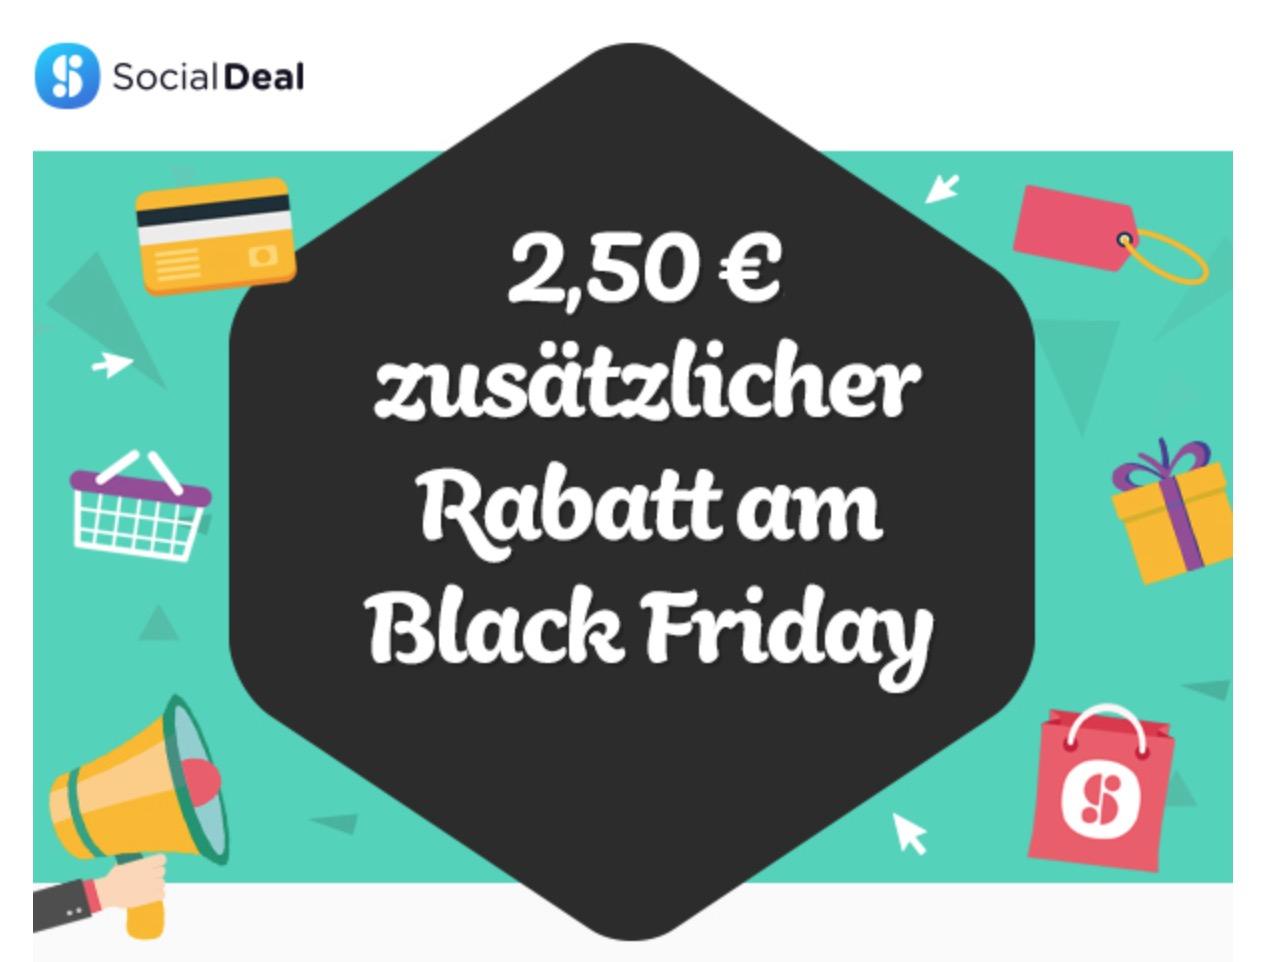 SocialDeal: 2,50 € Extra-Rabatt - Phantasialand Wintertraum für 32 €, Kölner Zoo für 8,40 €